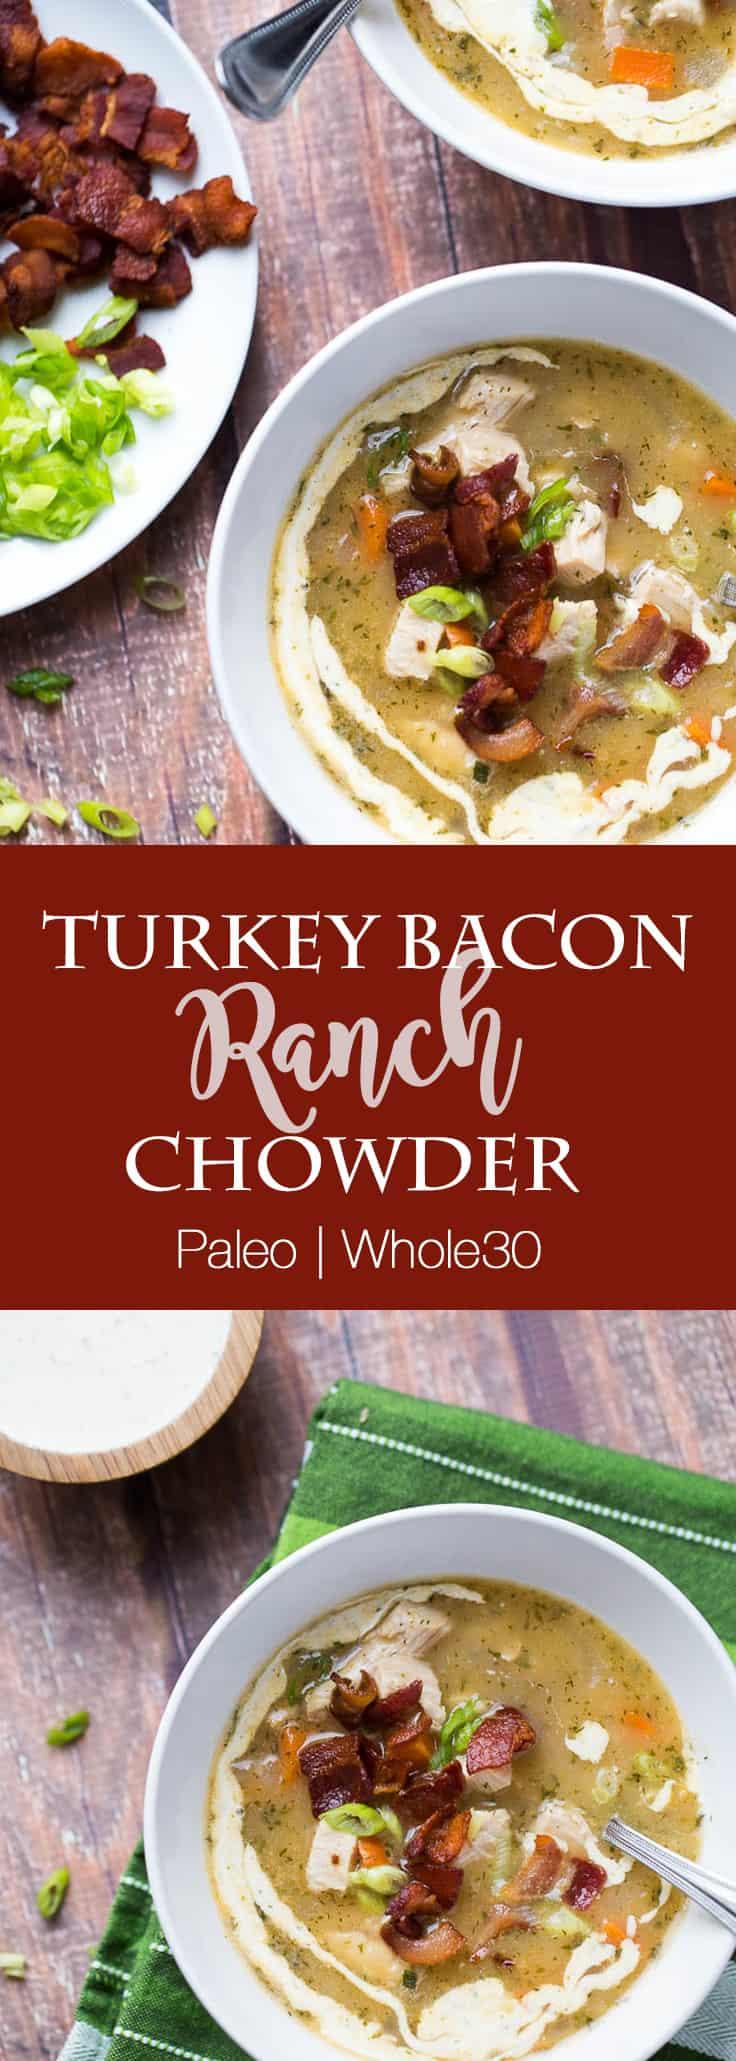 Paleo Turkey Bacon Ranch Chowder | perrysplate.com | paleo soup recipes | whole30 recipes